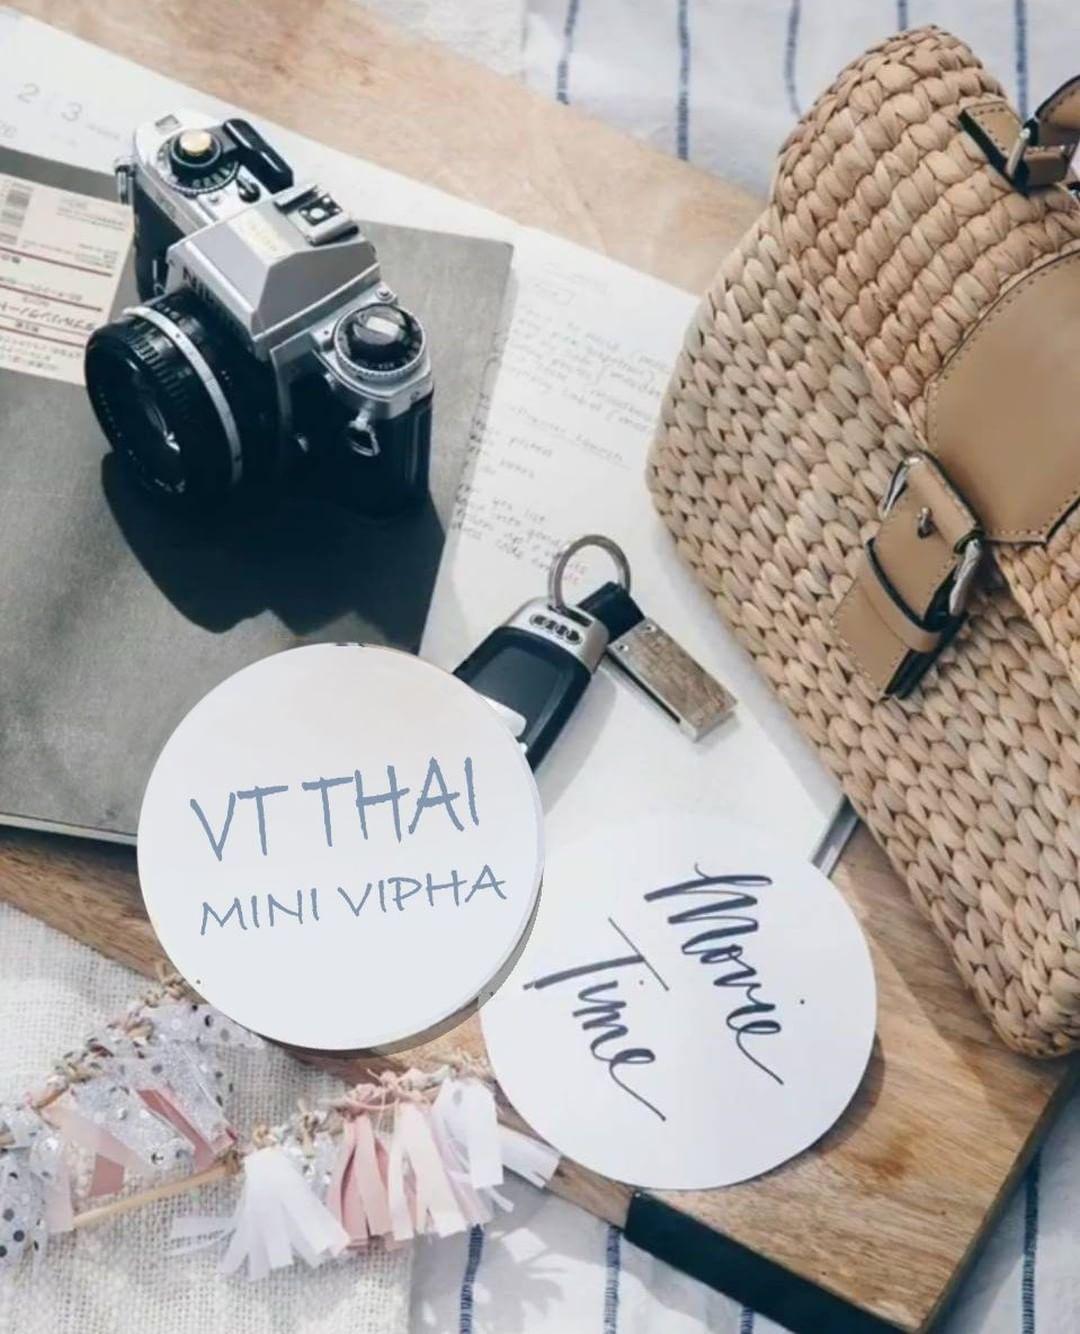 A Must Items For My Holiday Mini Vipha Bag Www Vtthai Com Strawbag Wickerbag Handcrafted Handmade Lifestyle Lifestyleblog Ootd